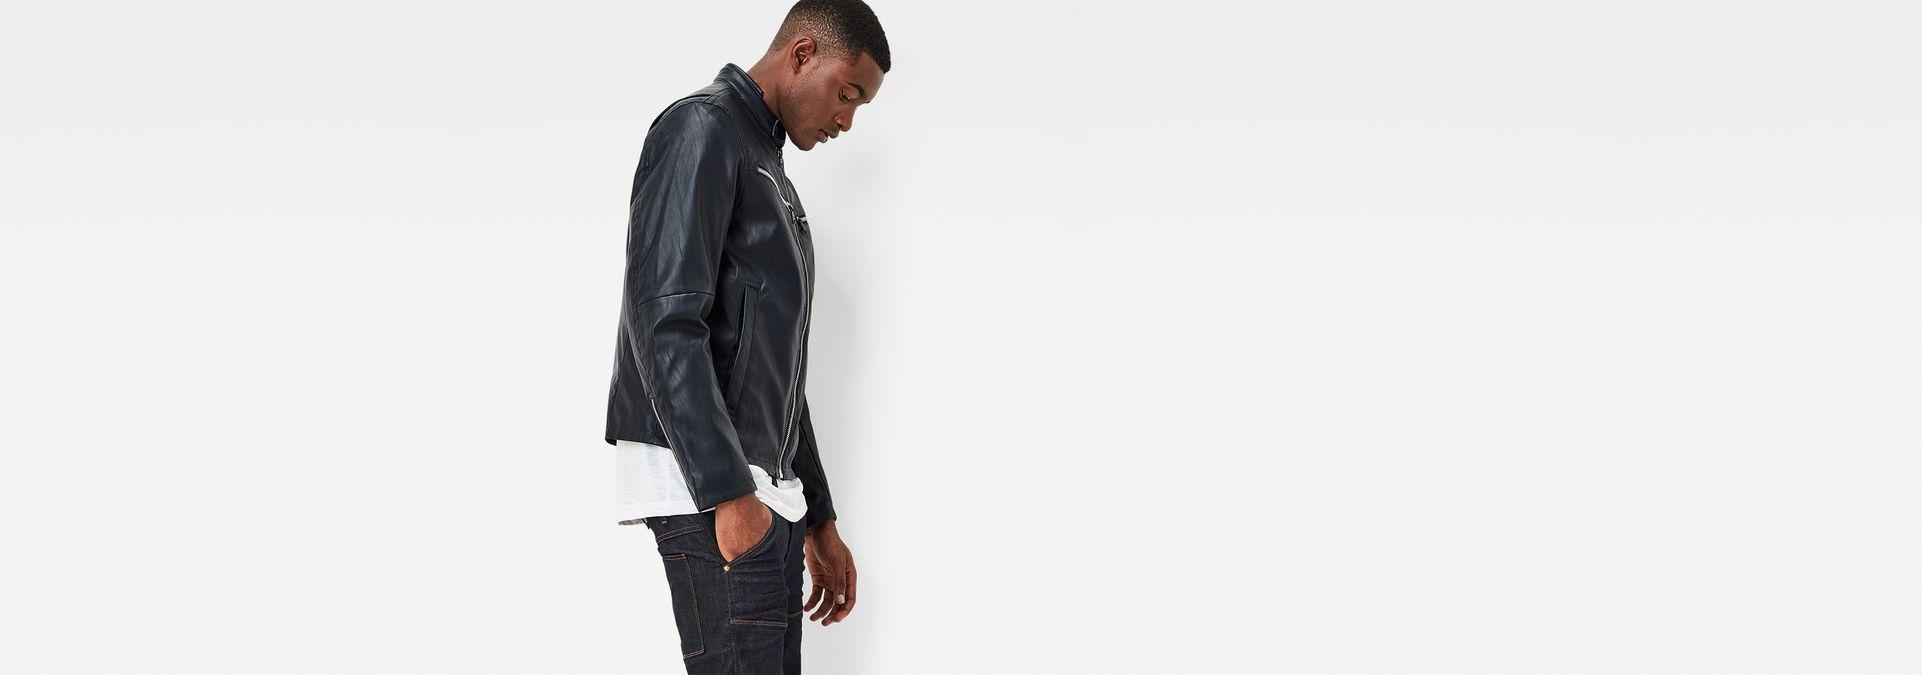 Mower Gpl Jacket Mazarine Blue G Star Sale Men Raw Black Blazer Jaket Korea Style Sk 15 Dark Model Side